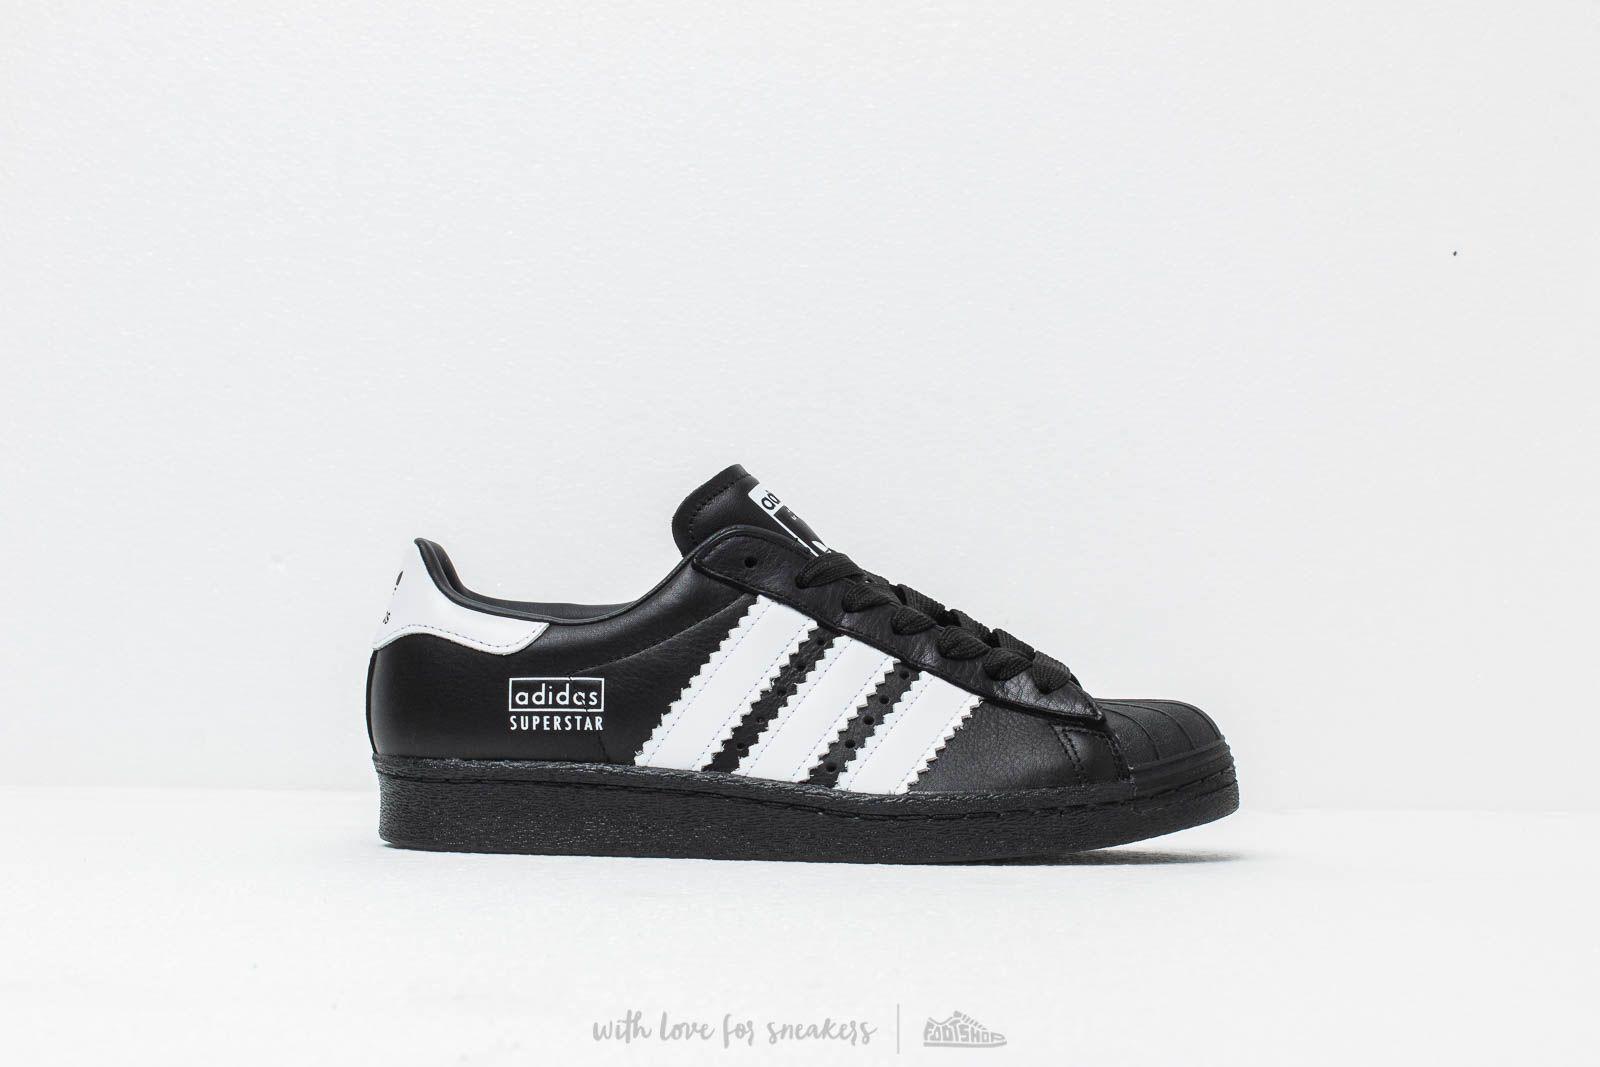 size 40 efefa bd065 Adidas Originals - Adidas Superstar 80s Core Black Ftw White Core Black  for Men. View fullscreen